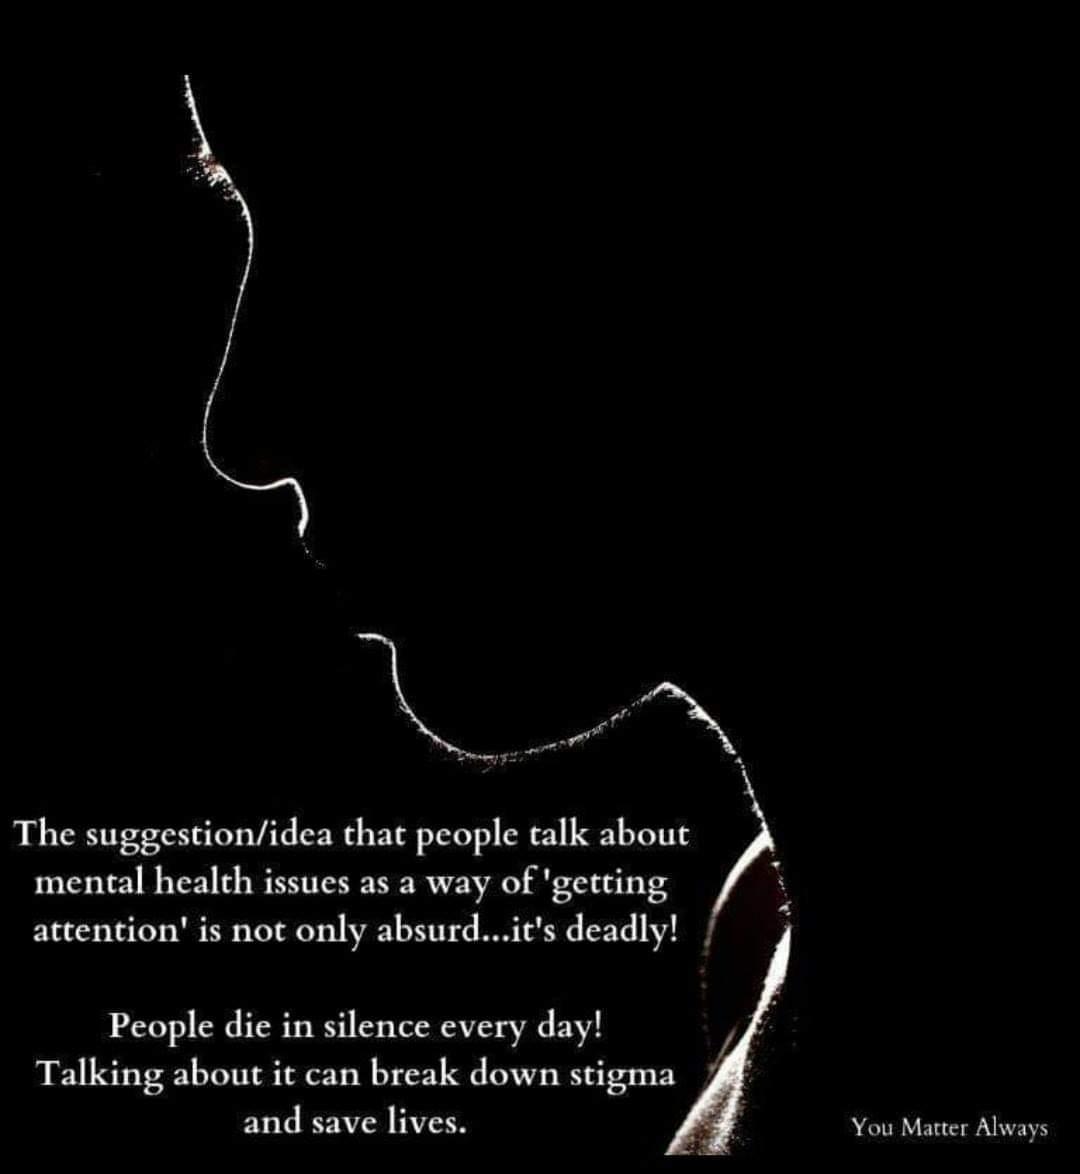 Some messages are worth repeating 💜💜💜 #YouMatterAlways #endstigma #noplaceformentalhealthstigma #stopthestigma #stigmatosupport #stigmafree #takeastand #itsokaytonotbeokay #itsneverokaytodiscriminate https://t.co/lhDJjs4Hcf